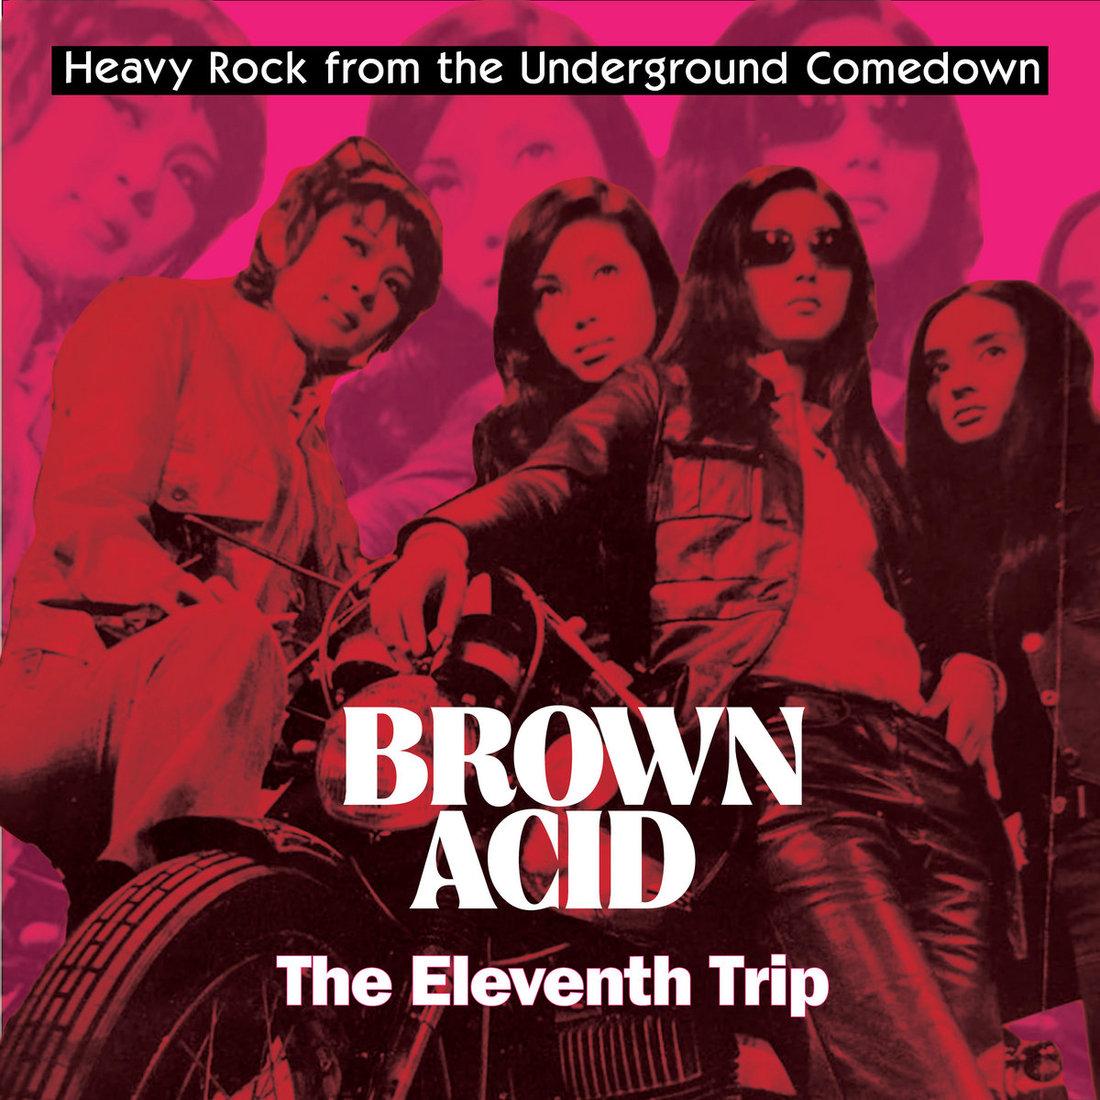 V.A. - Brown Acid - The Eleventh Trip (Riding Easy Records)